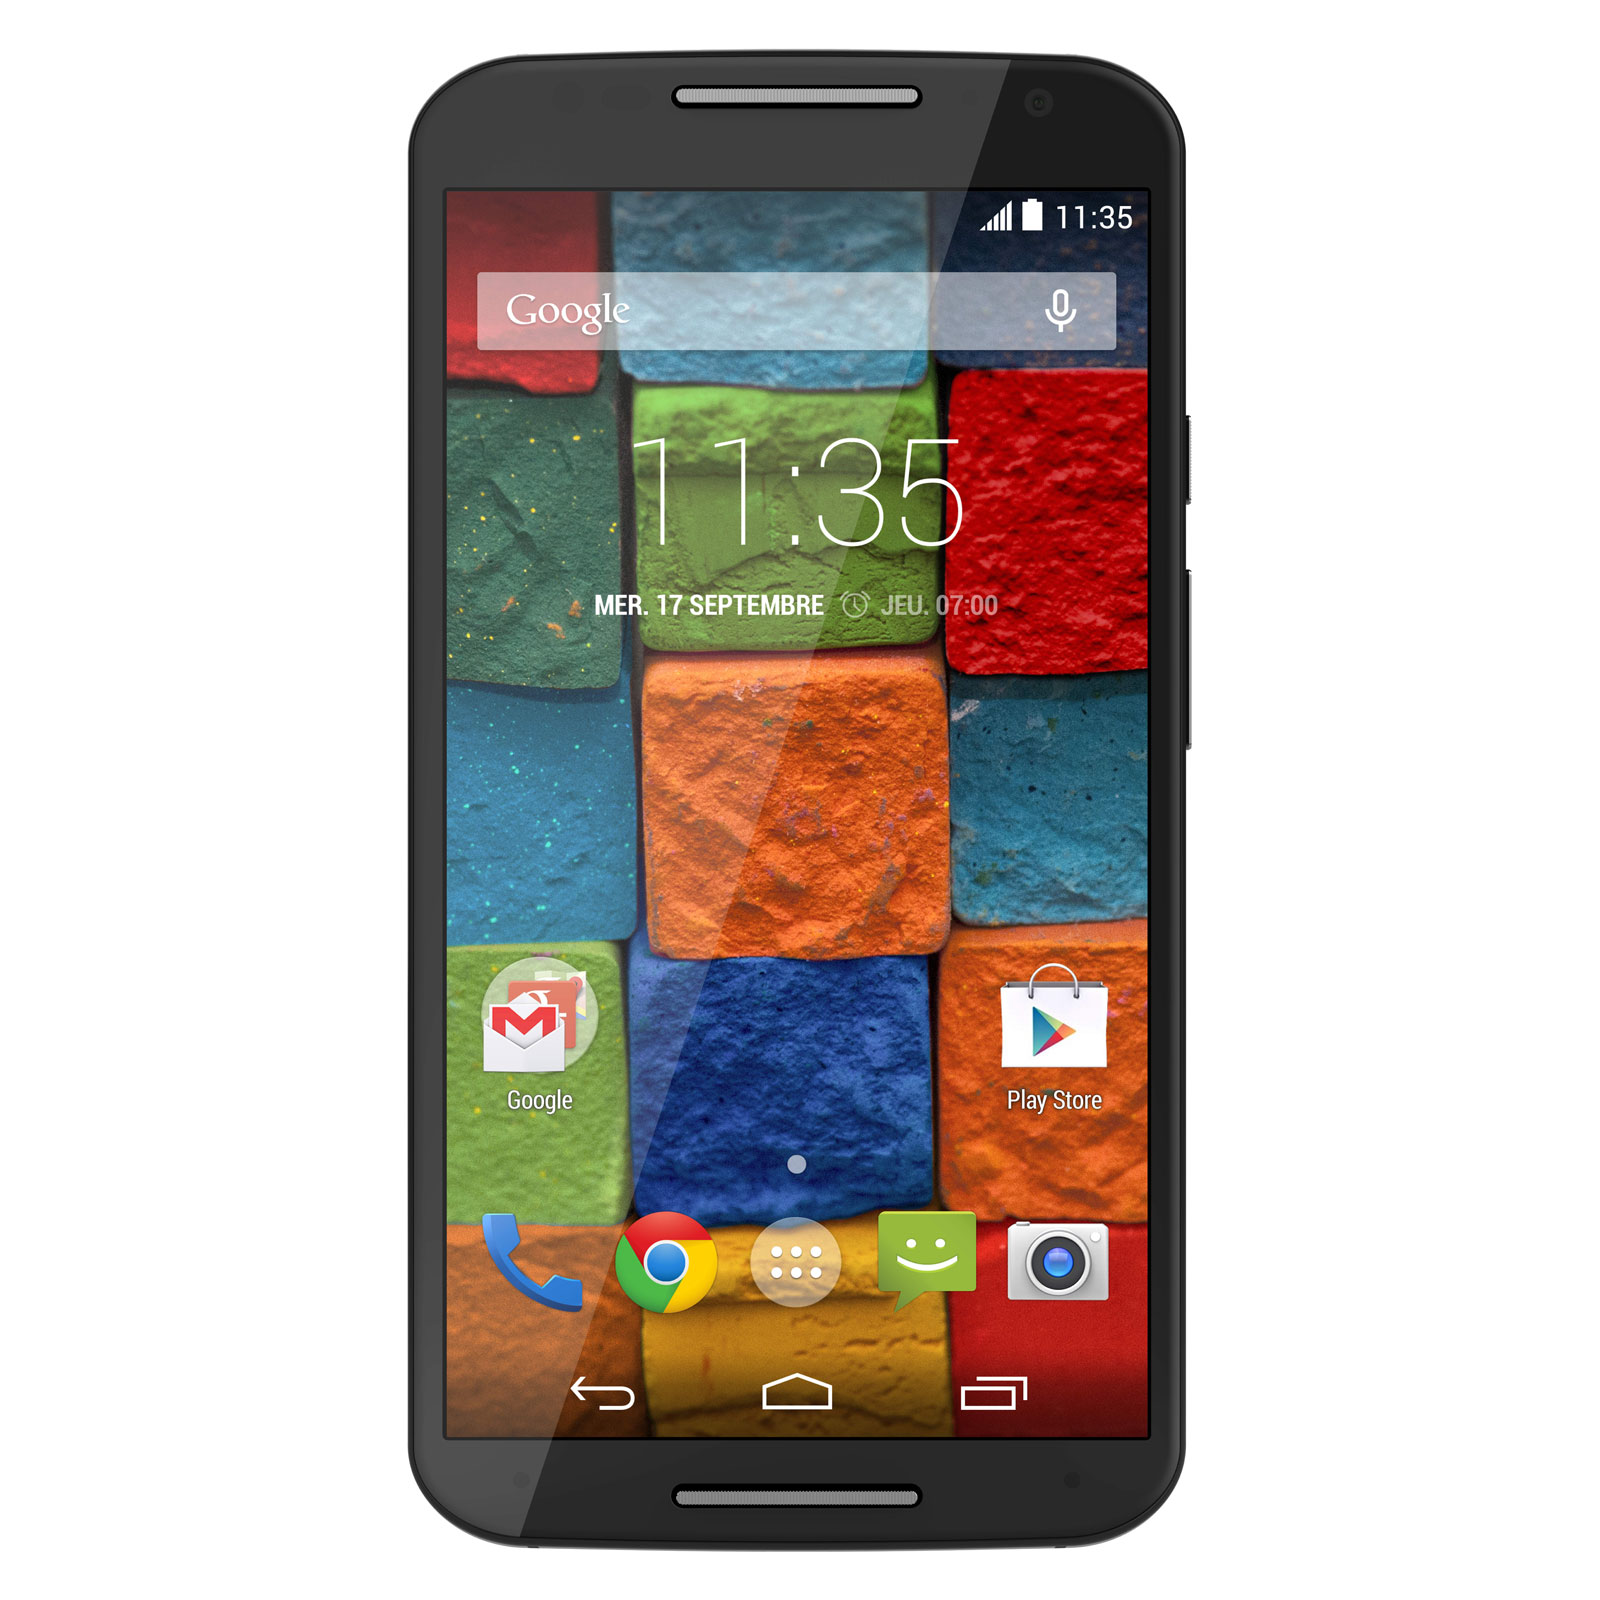 "Mobile & smartphone Motorola Moto X+1 16 Go Noir Smartphone 4G-LTE avec écran tactile Full HD AMOLED 5.2"" sous Android 4.4"